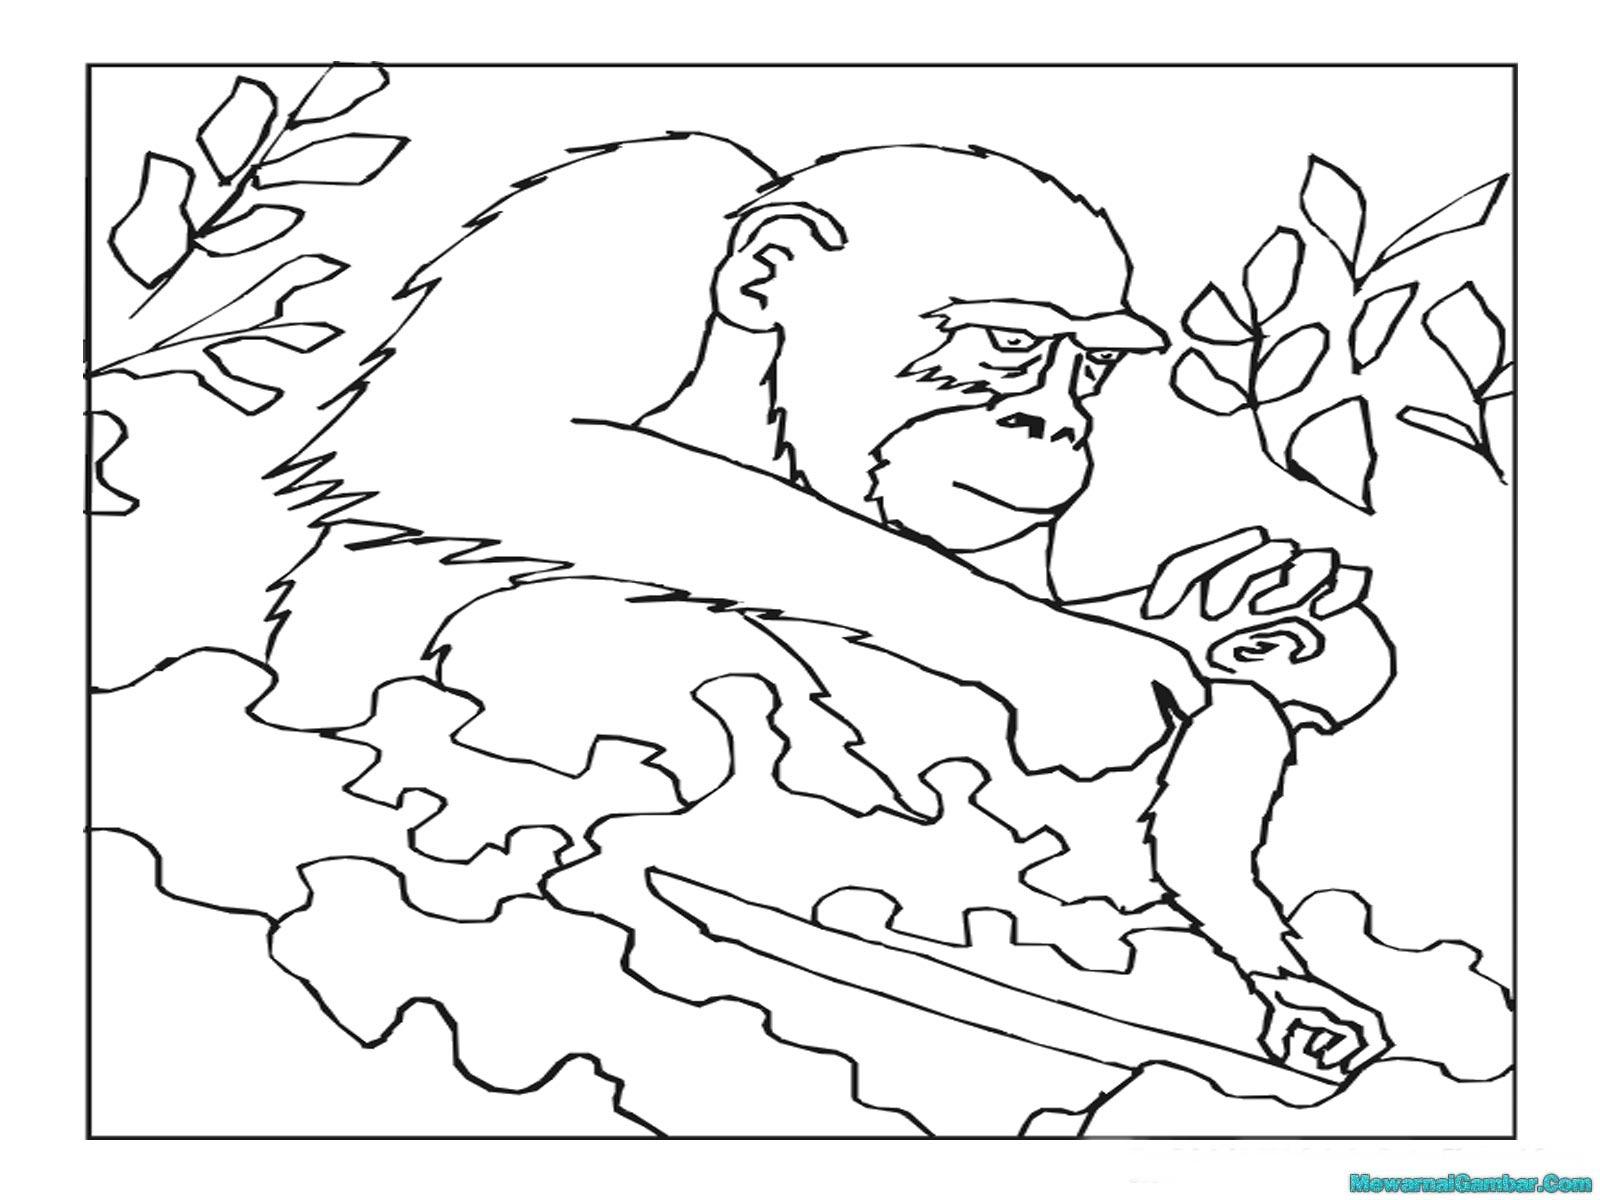 Mewarnai Gambar Gorila Sedang Memakan Buah Pisang Mewarnai Gambar Gorila Sedang Mencari Kutu Ditubuh Anaknya Yang Masih Kecil